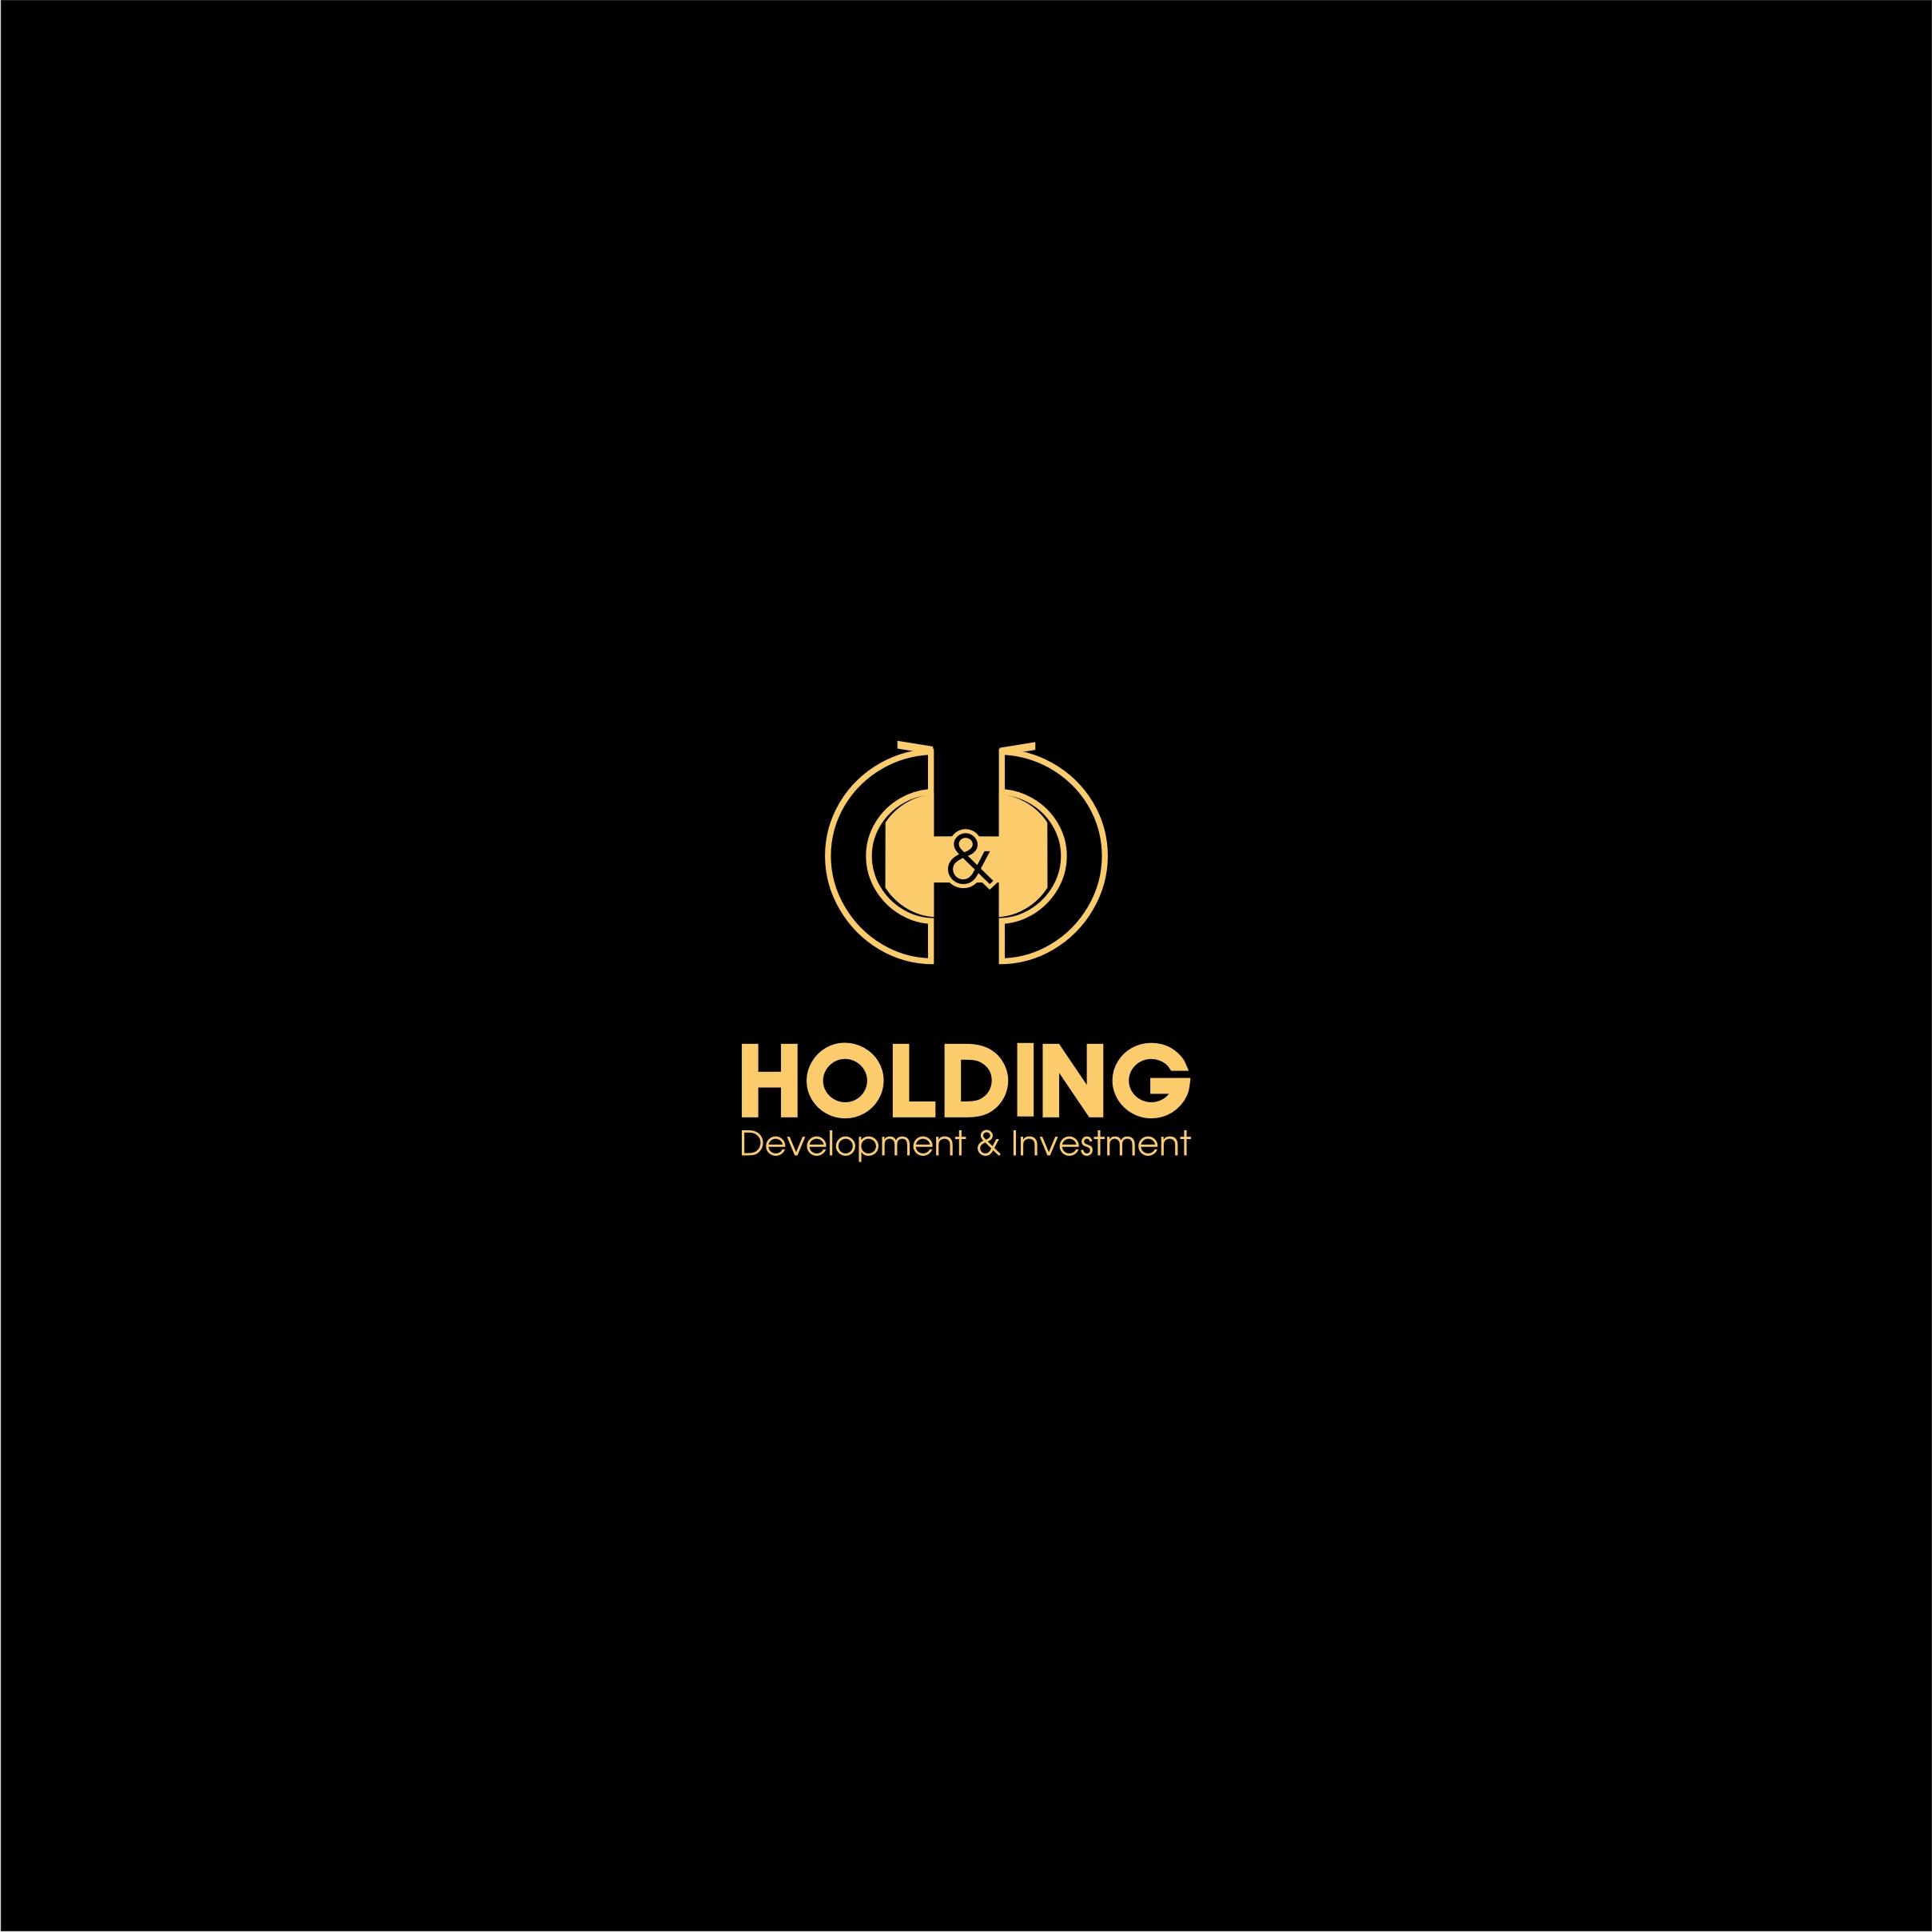 "Разработка Логотипа +  Фирменного знака для компании ""O & O HOLDING"" фото f_1335c8508afd1f96.jpg"